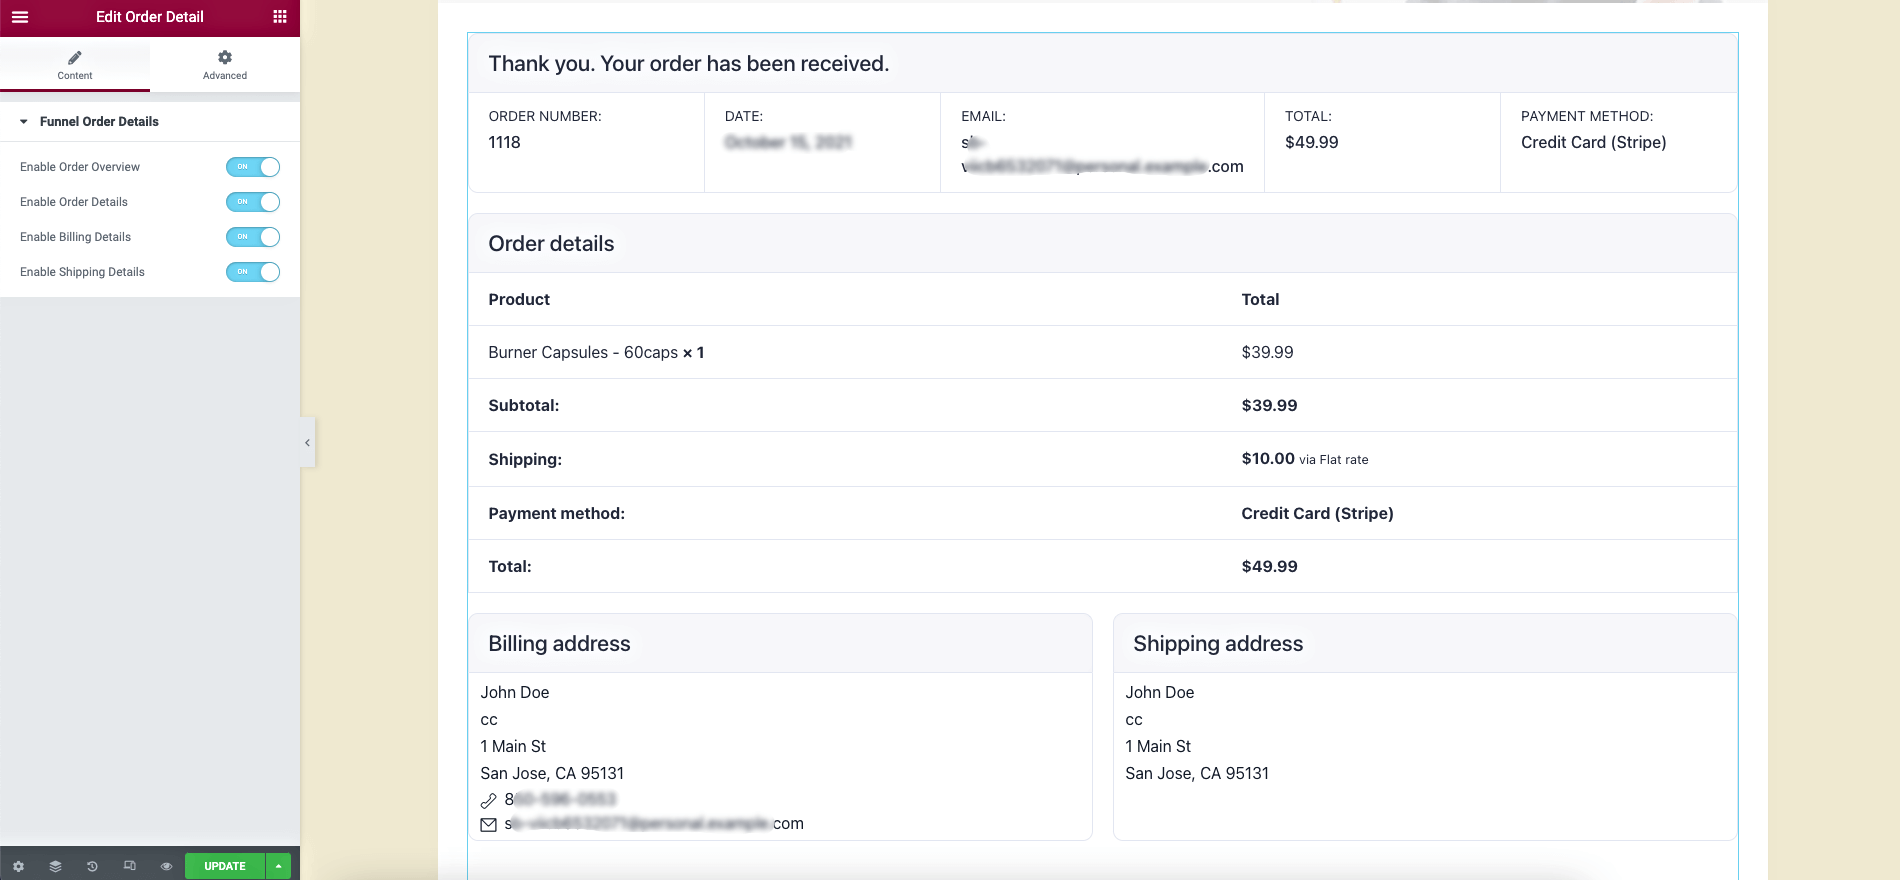 Thank you step order details widget